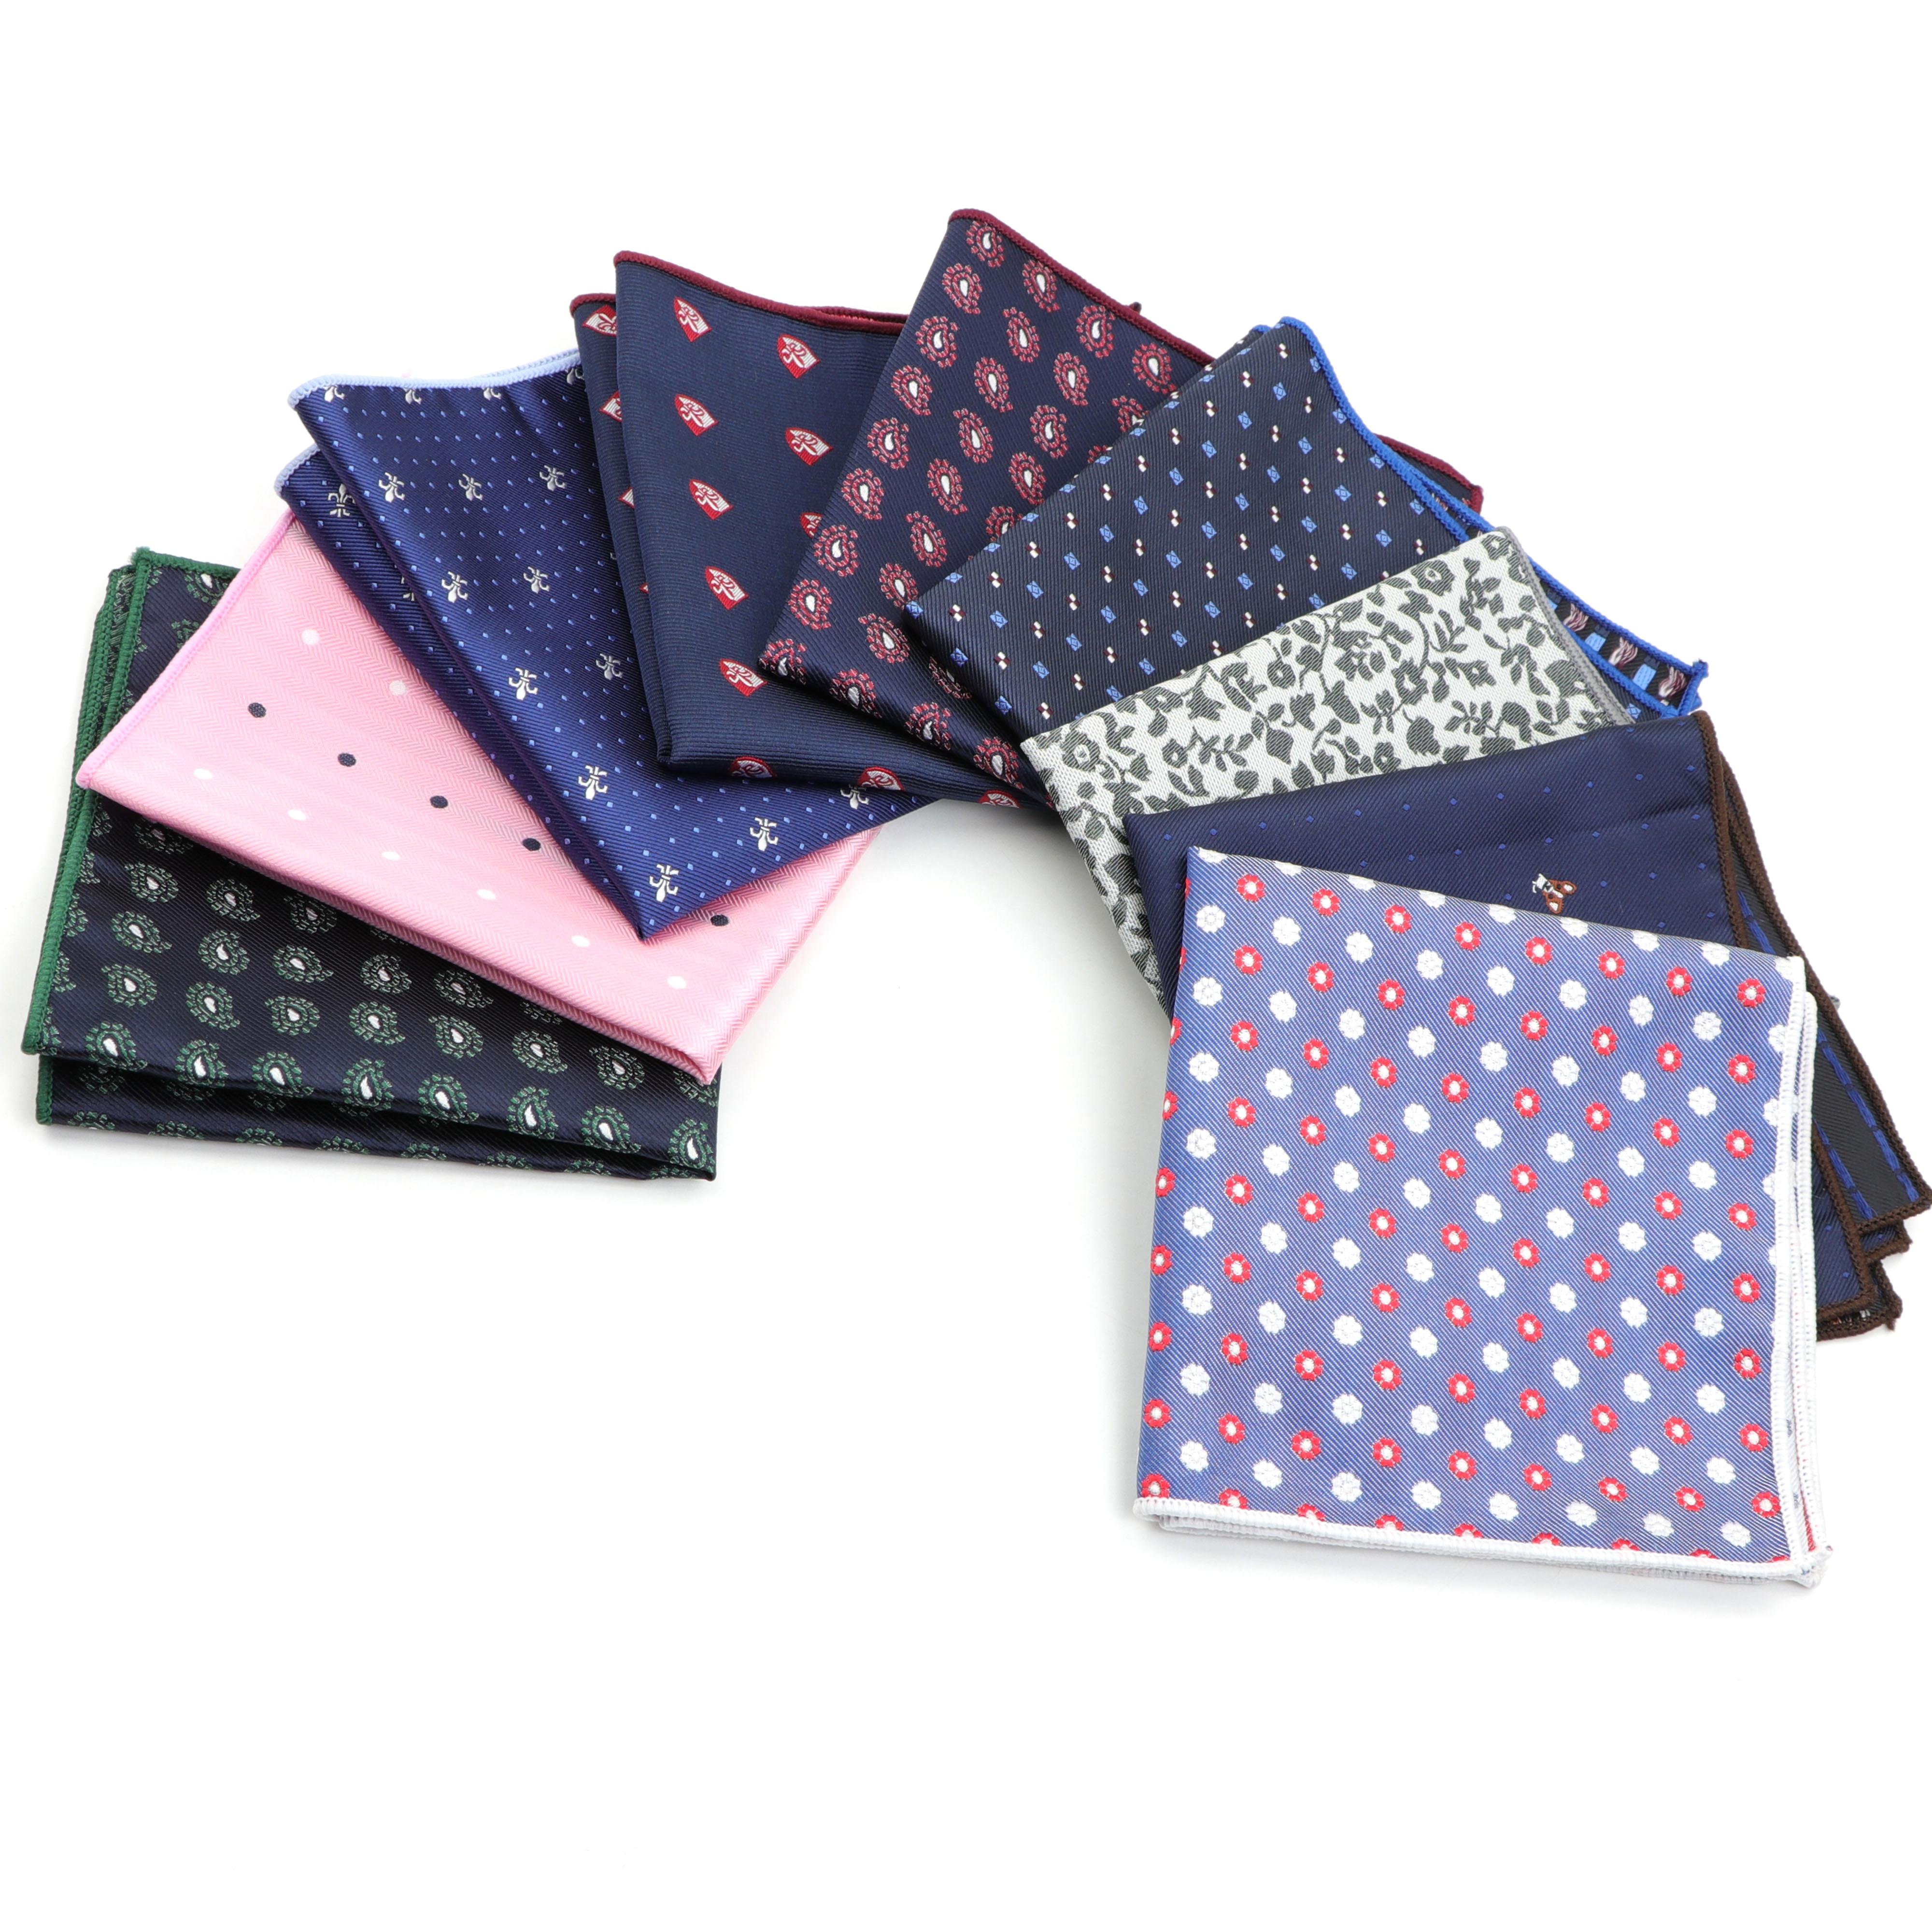 Men's Handkerchief Polka Dot Striped Woven Printing Pocket Square Hankies Business Casual Polyester Hanky NO.1-26